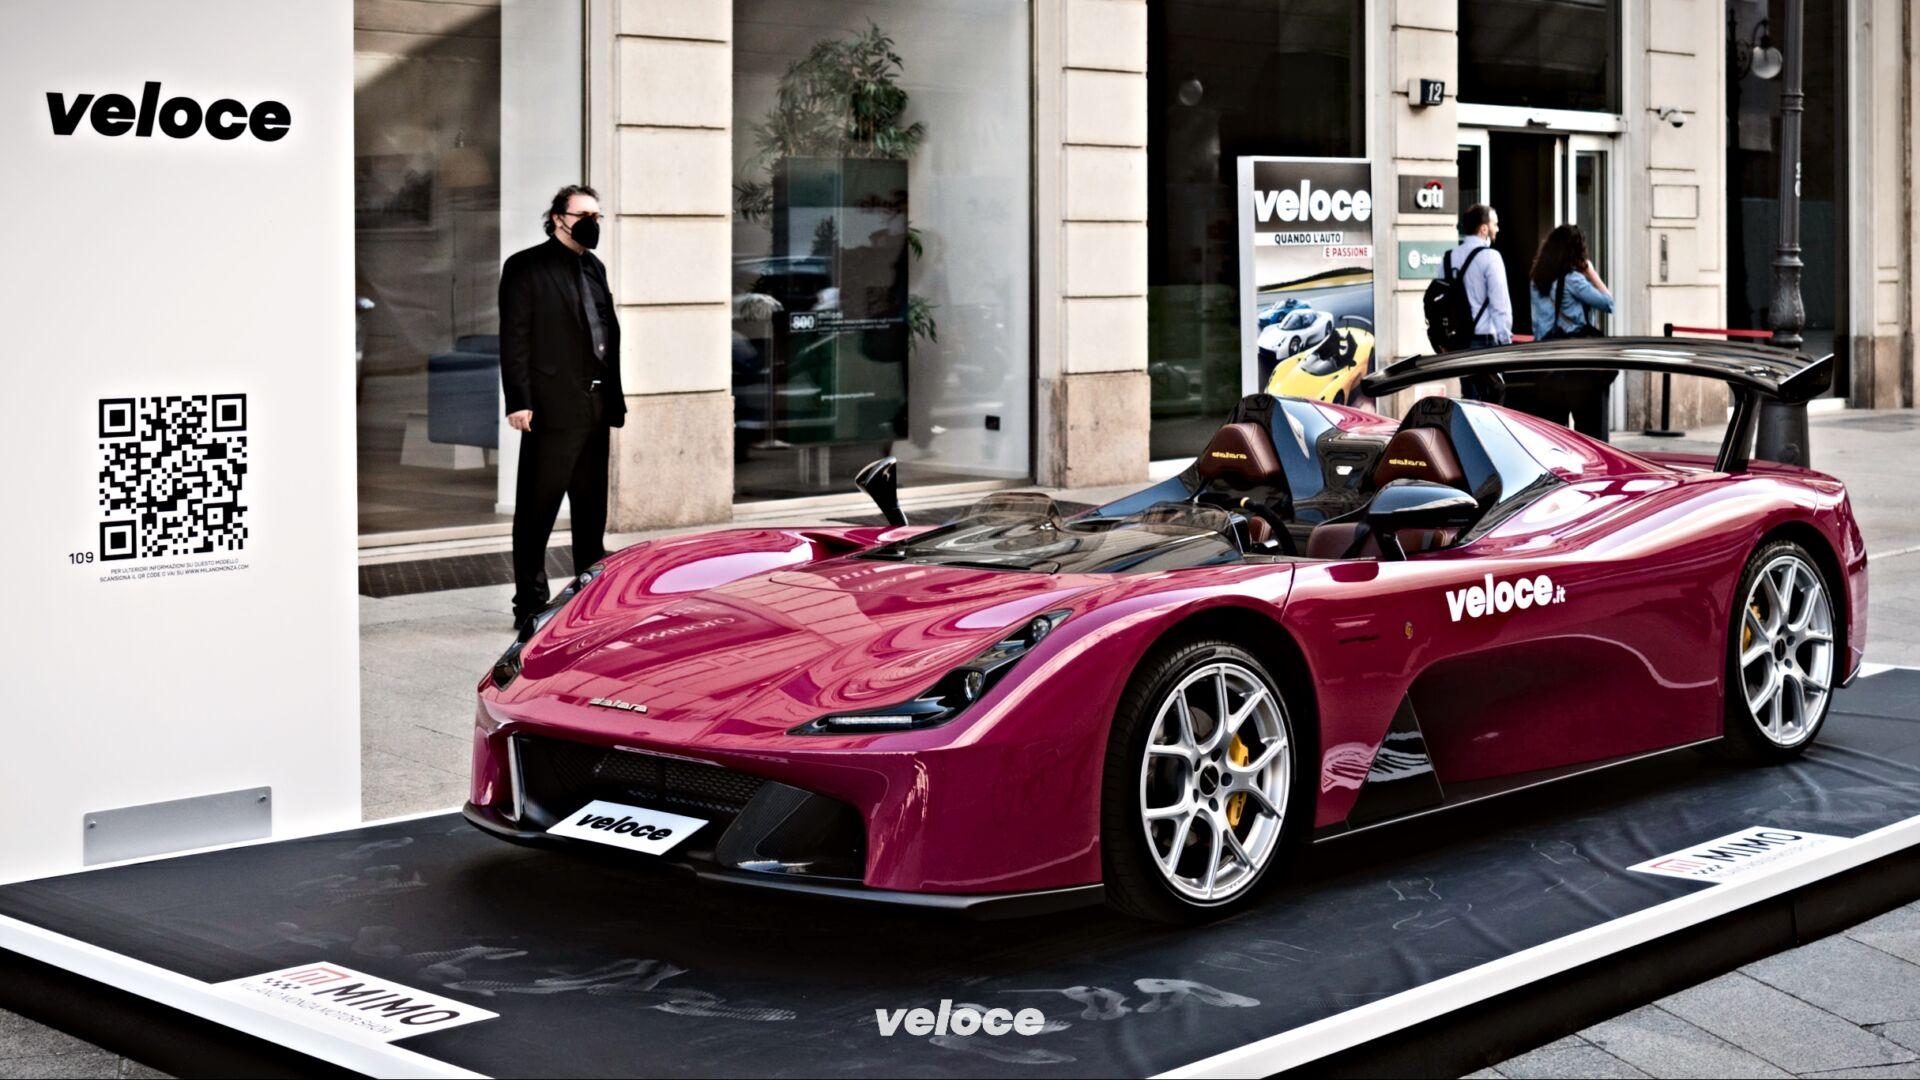 Dallara-Stradale-stand-veloce-mimo-2021-1920x1080.jpg